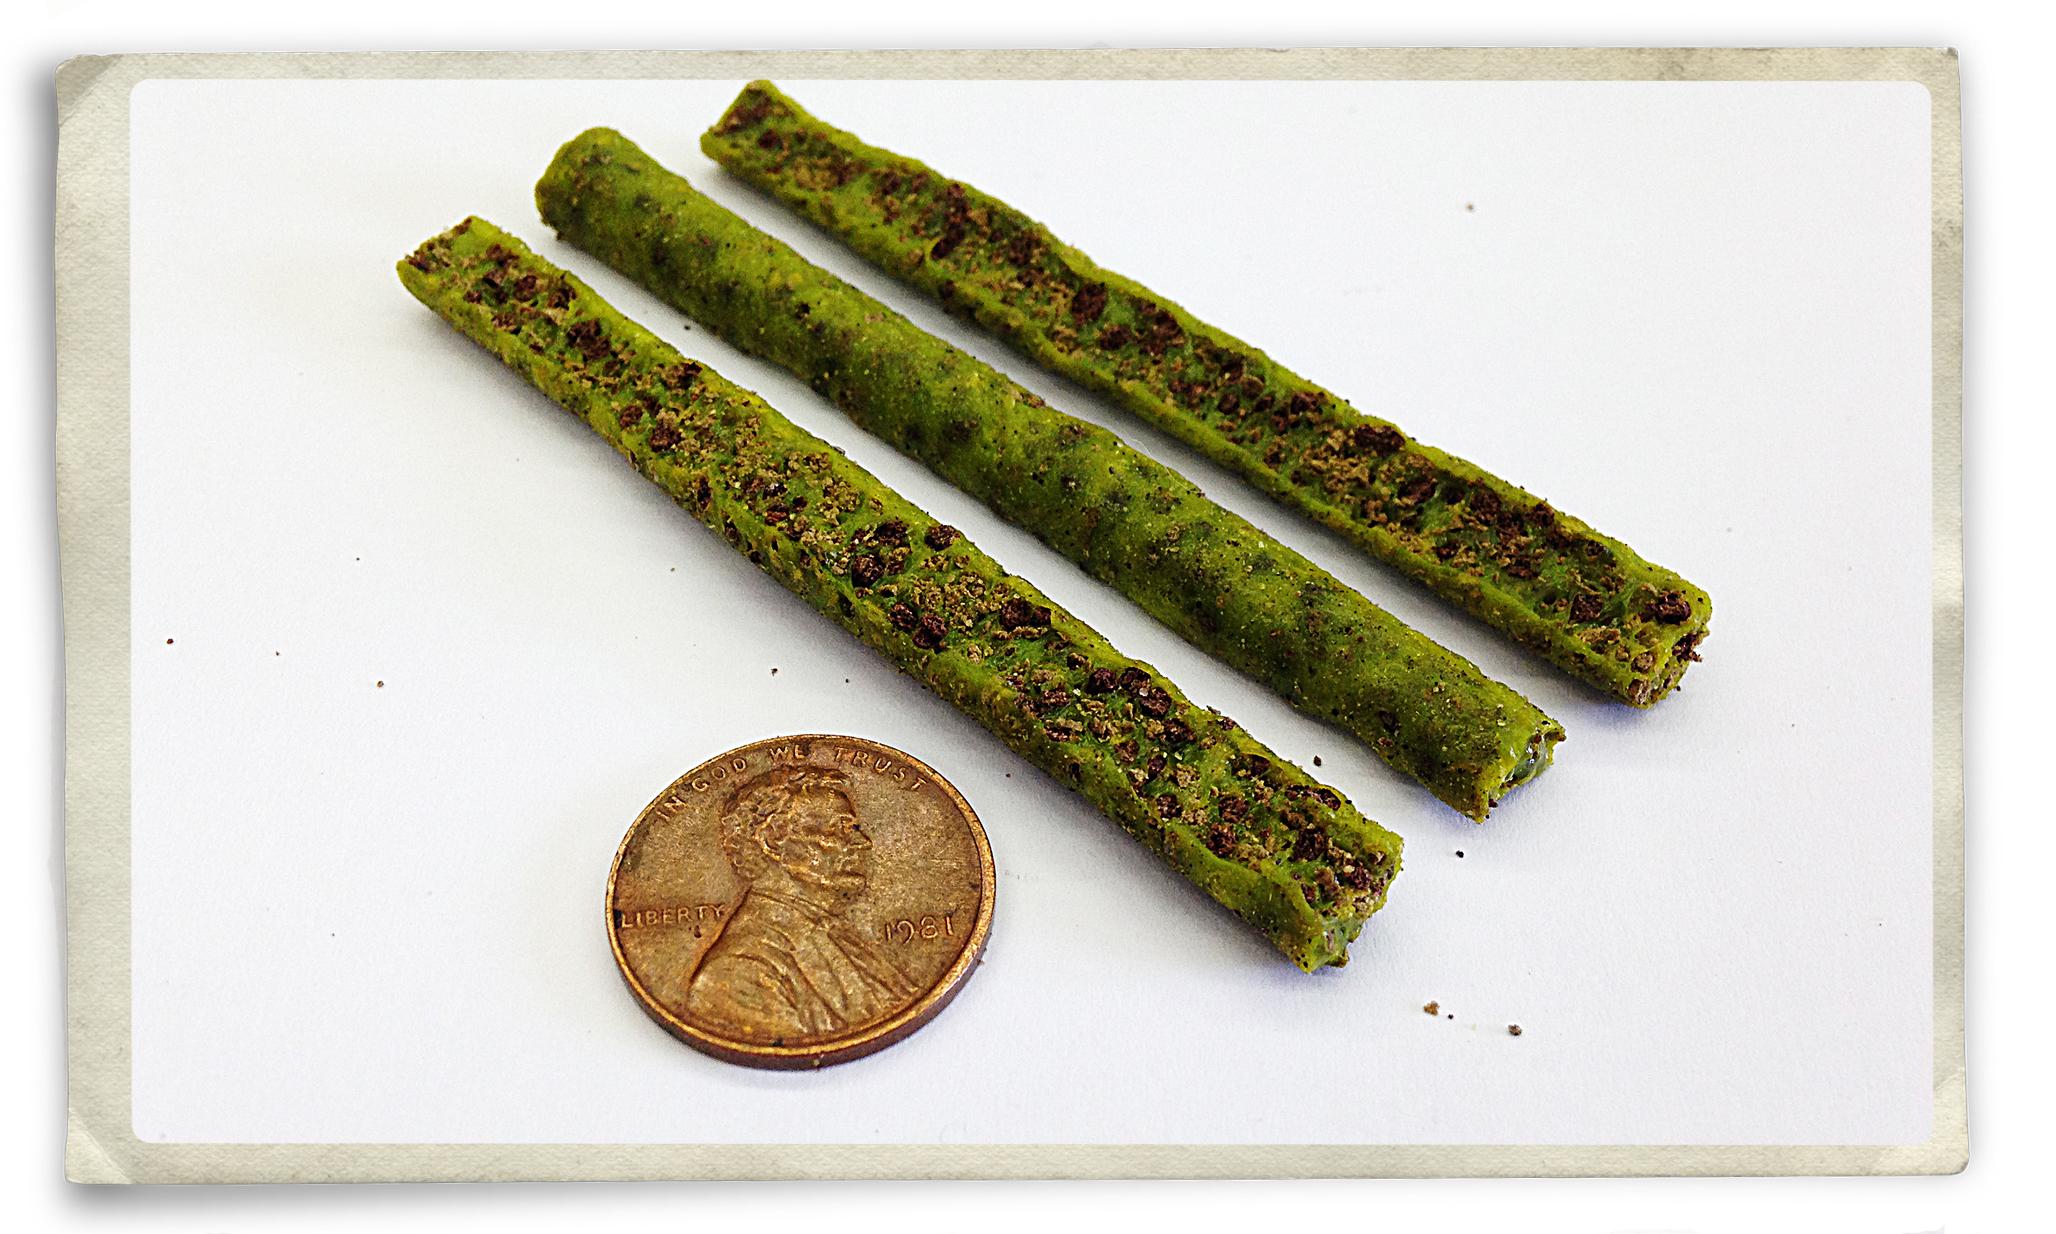 new-lbug-3-inch-worms.jpg